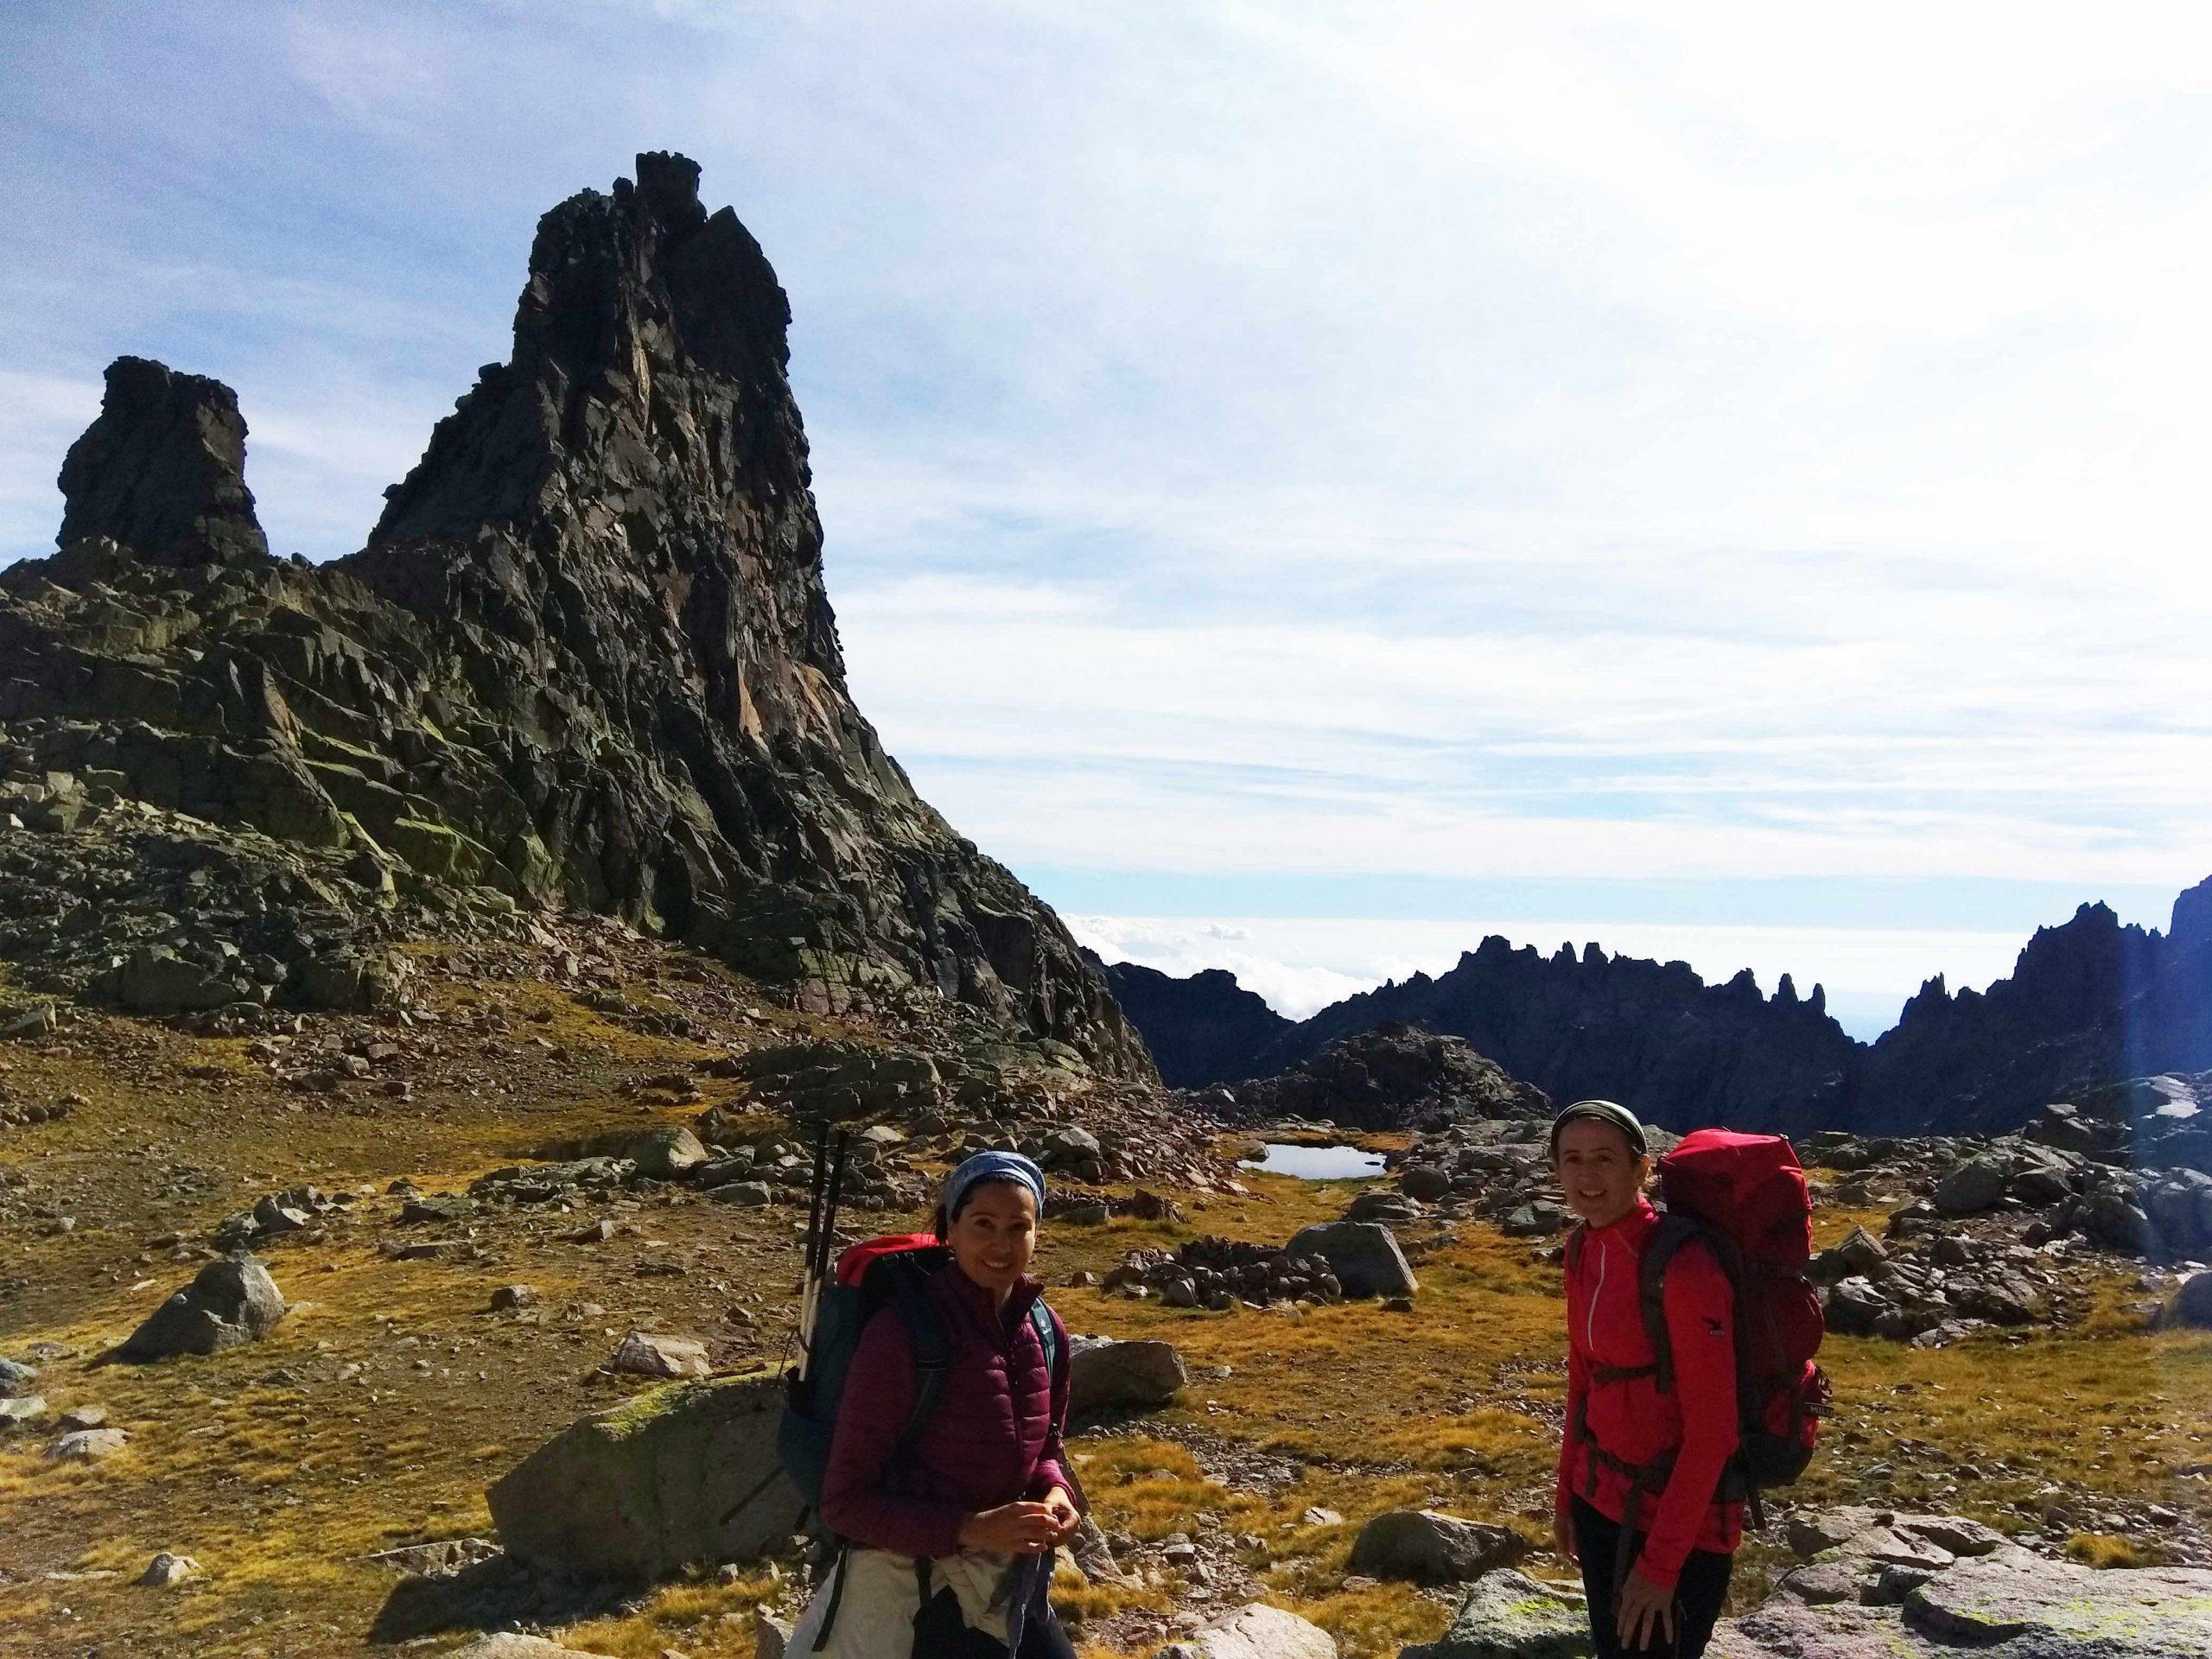 Trekking en la Sierra de Gredos